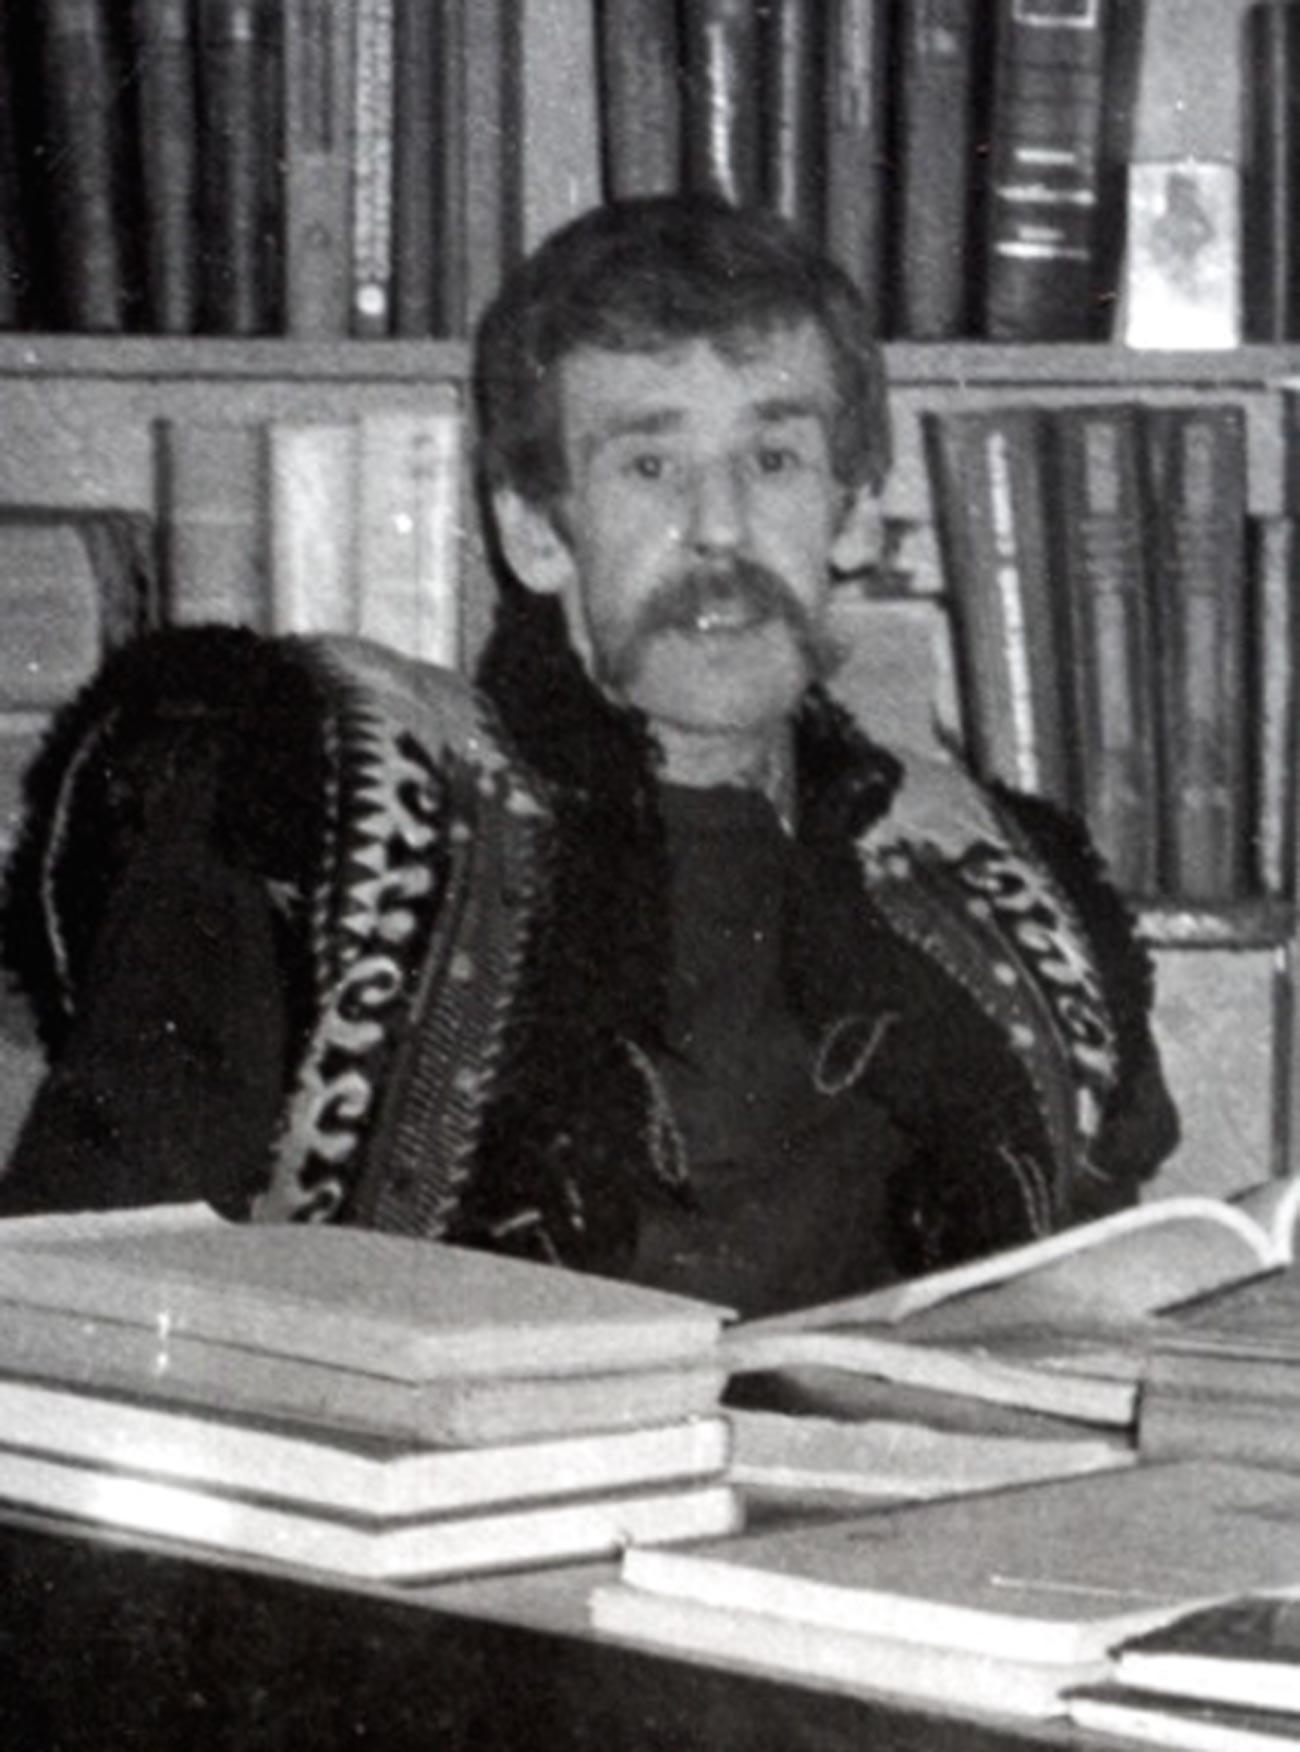 Il traduttore sovietico Andrej Kistjakovskij (1936-1987)